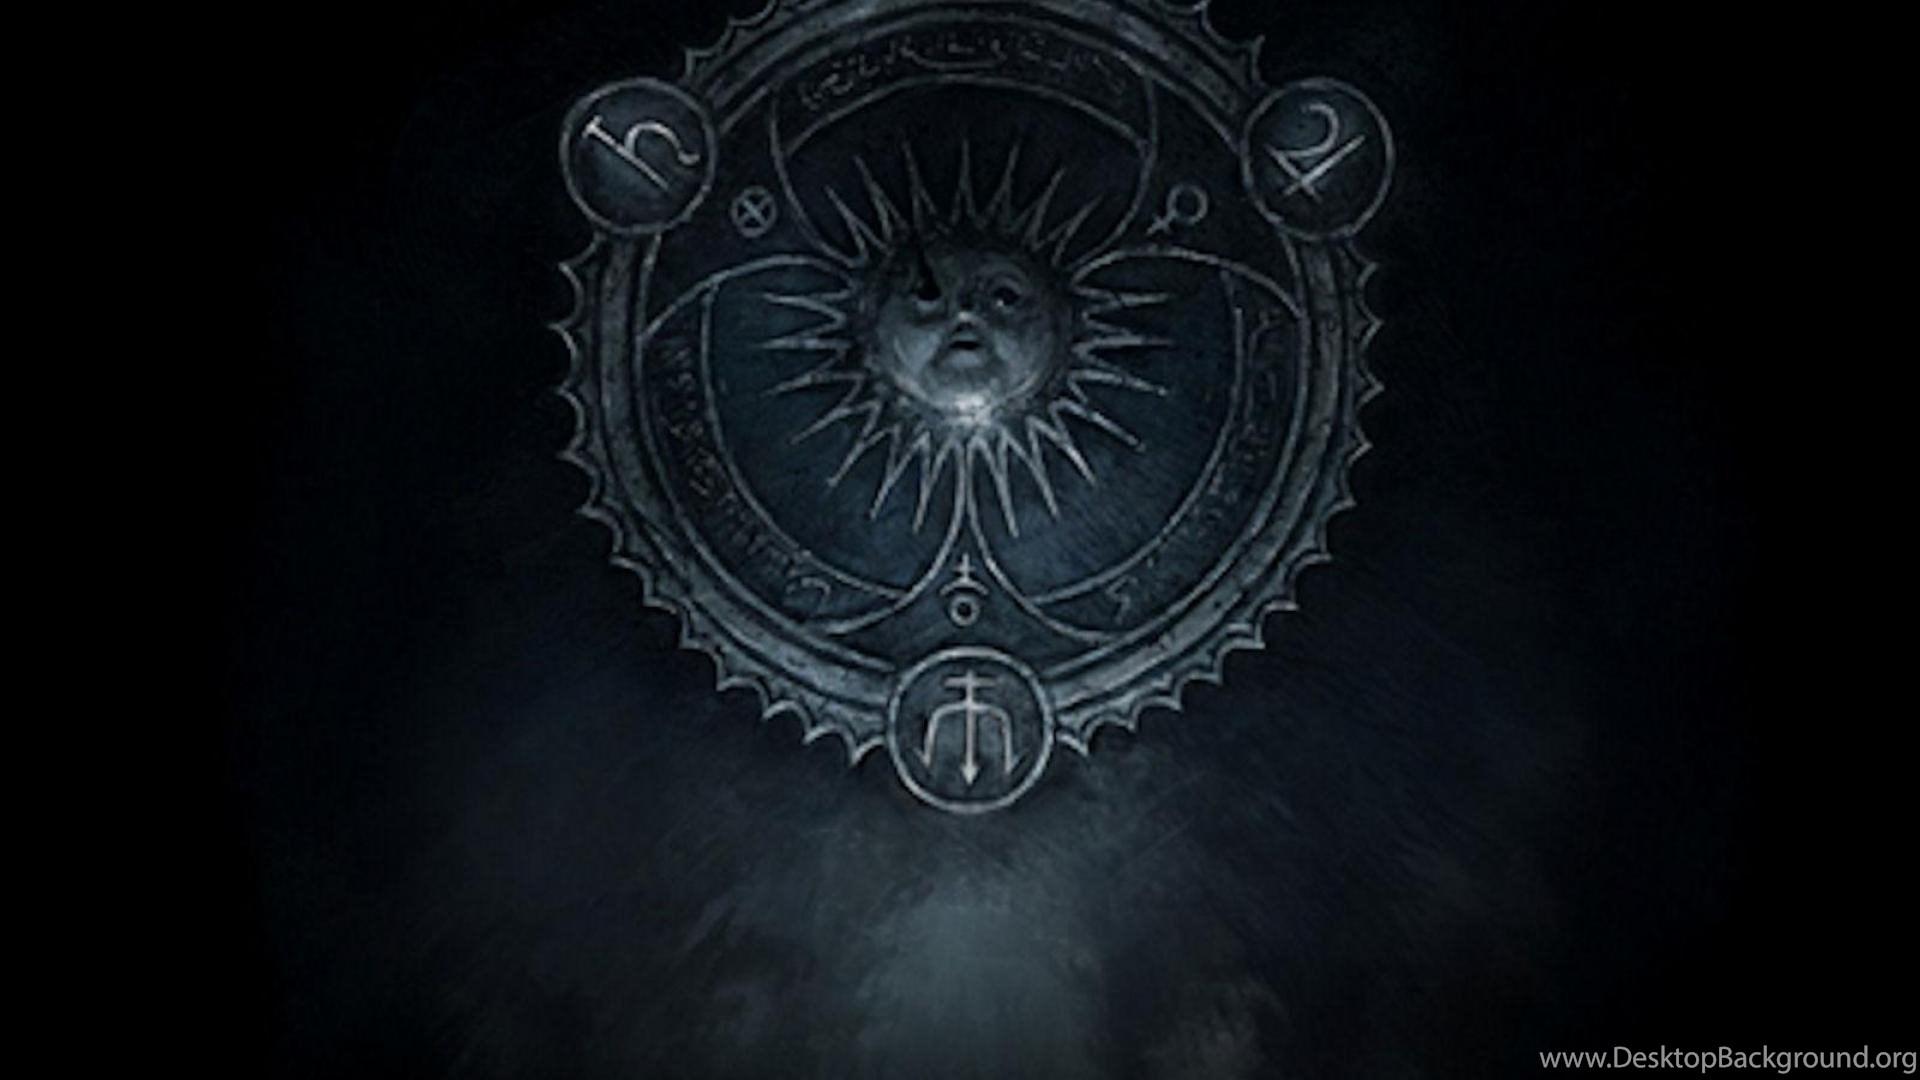 Amnesia The Dark Descent Wallpaper Desktop Background